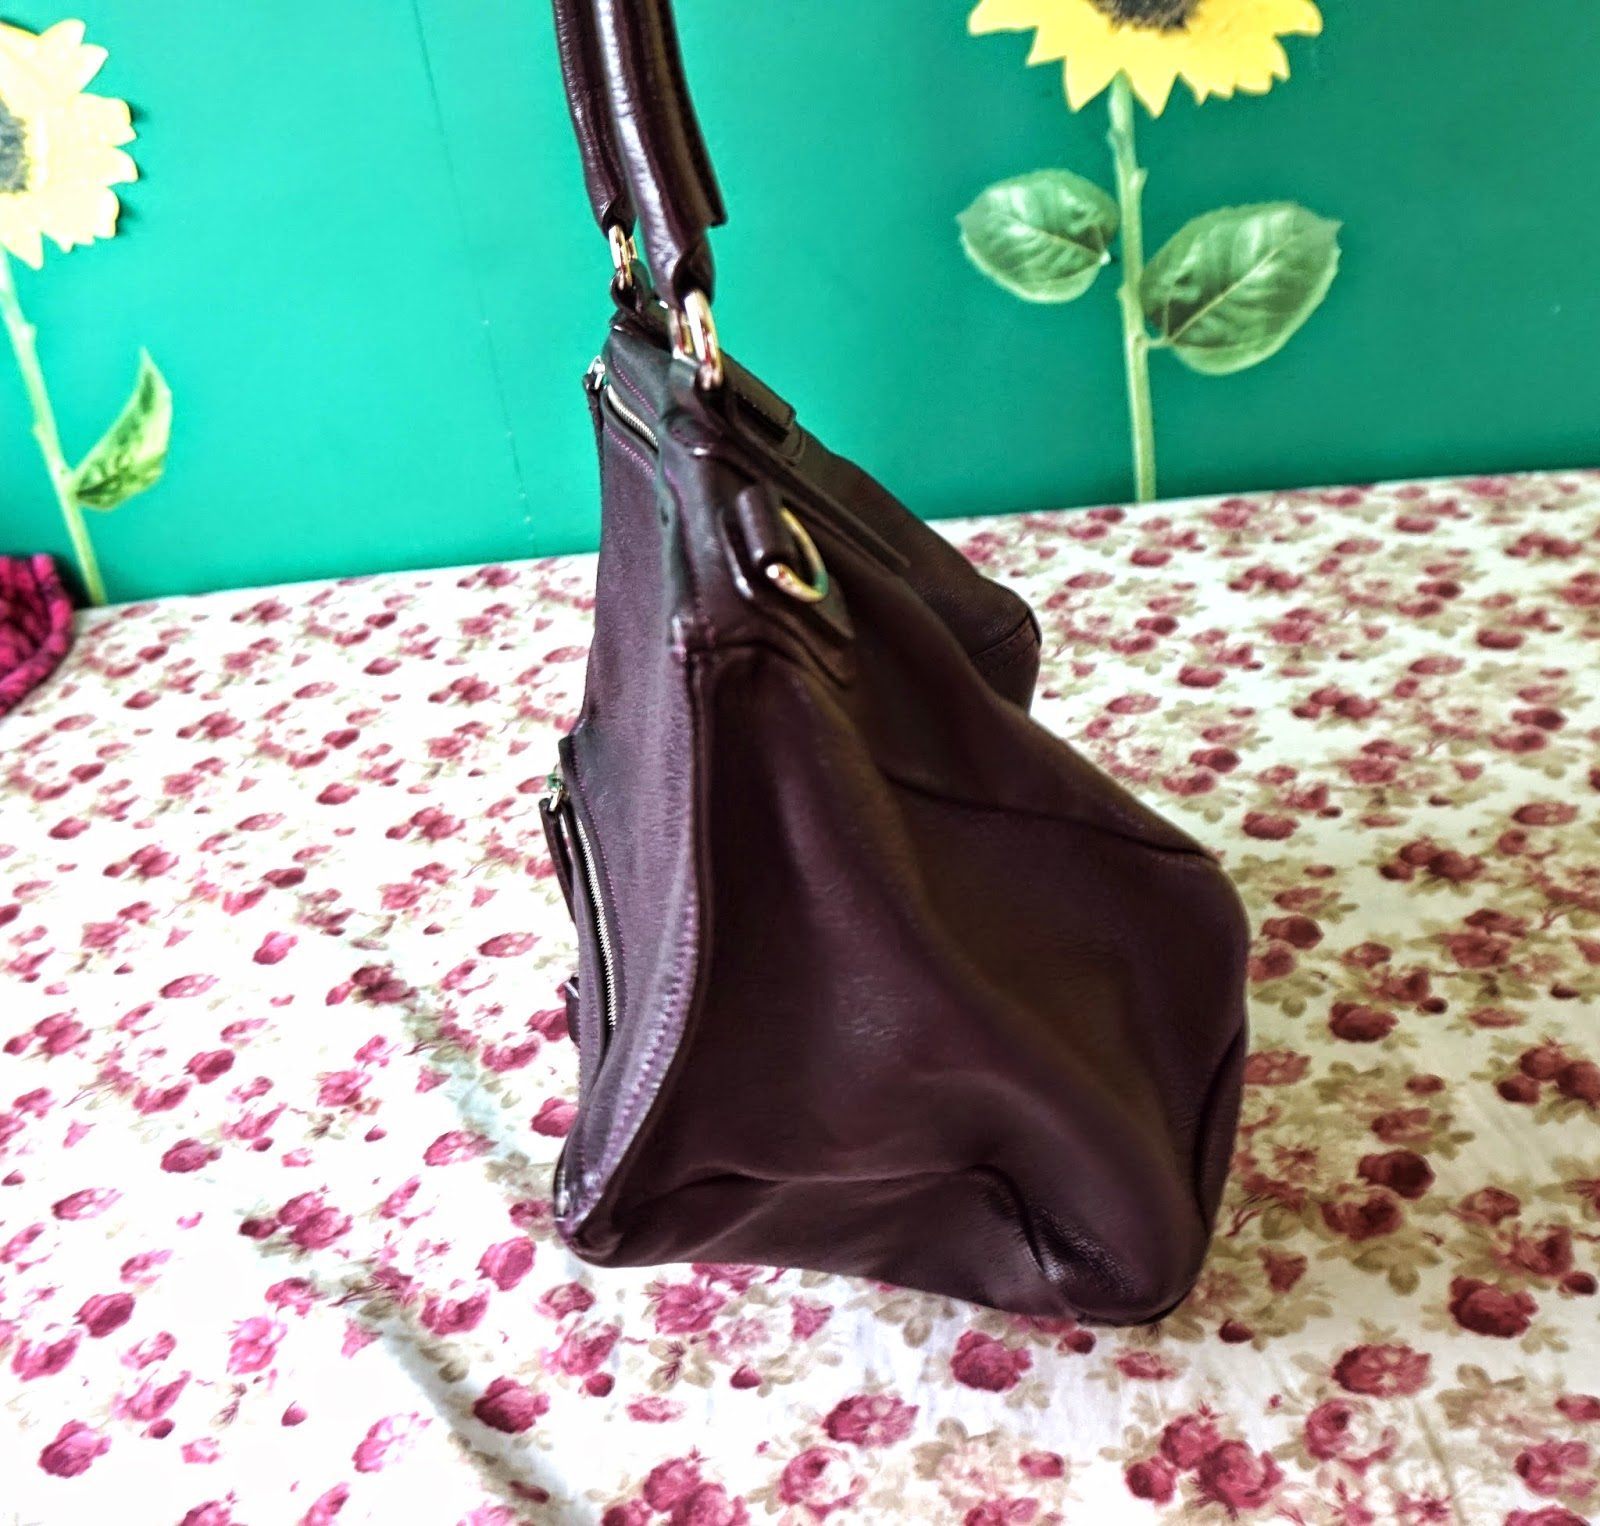 d26bf9b313d4 BAG REVIEW  Givenchy Pandora Medium in Aube + Spot A Fake Givenchy ...